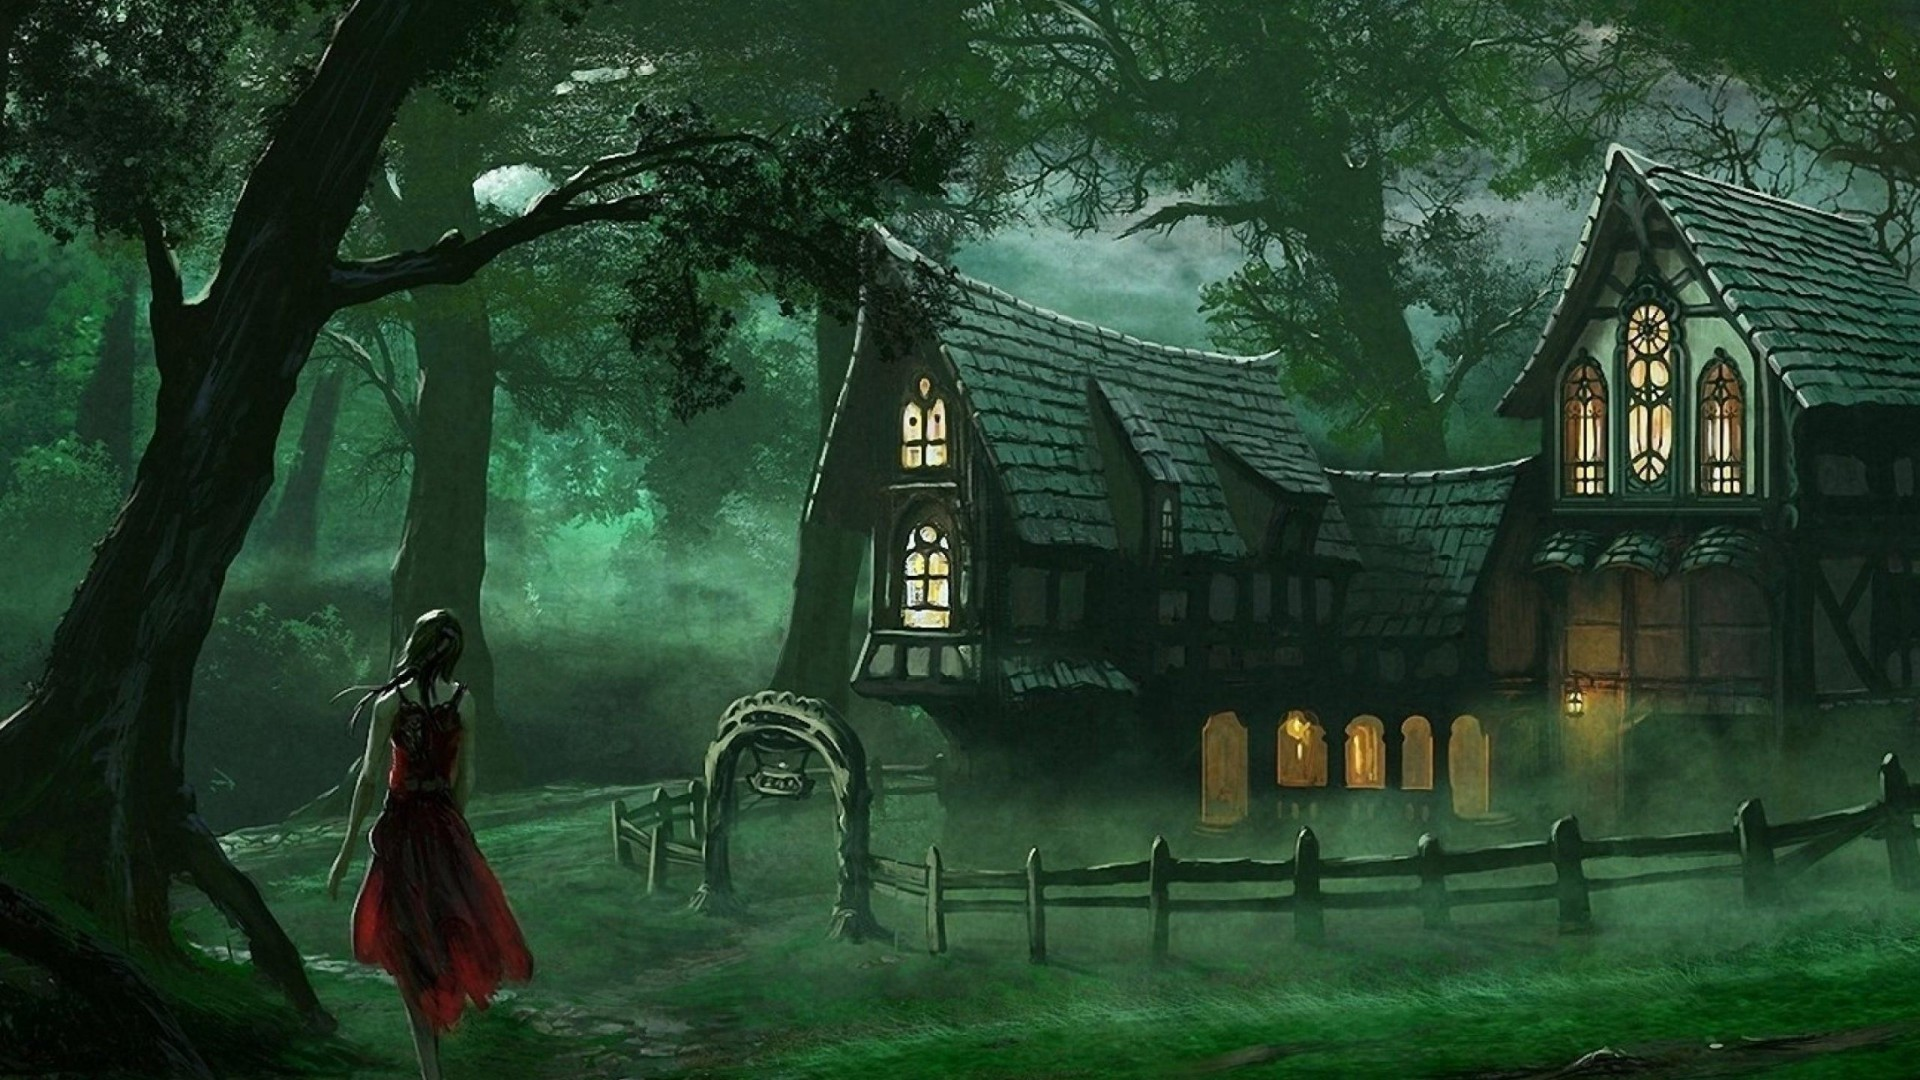 Spooky House Fantasy Forest Wallpaper Hd 1920 1080 1920x1080 Download Hd Wallpaper Wallpapertip